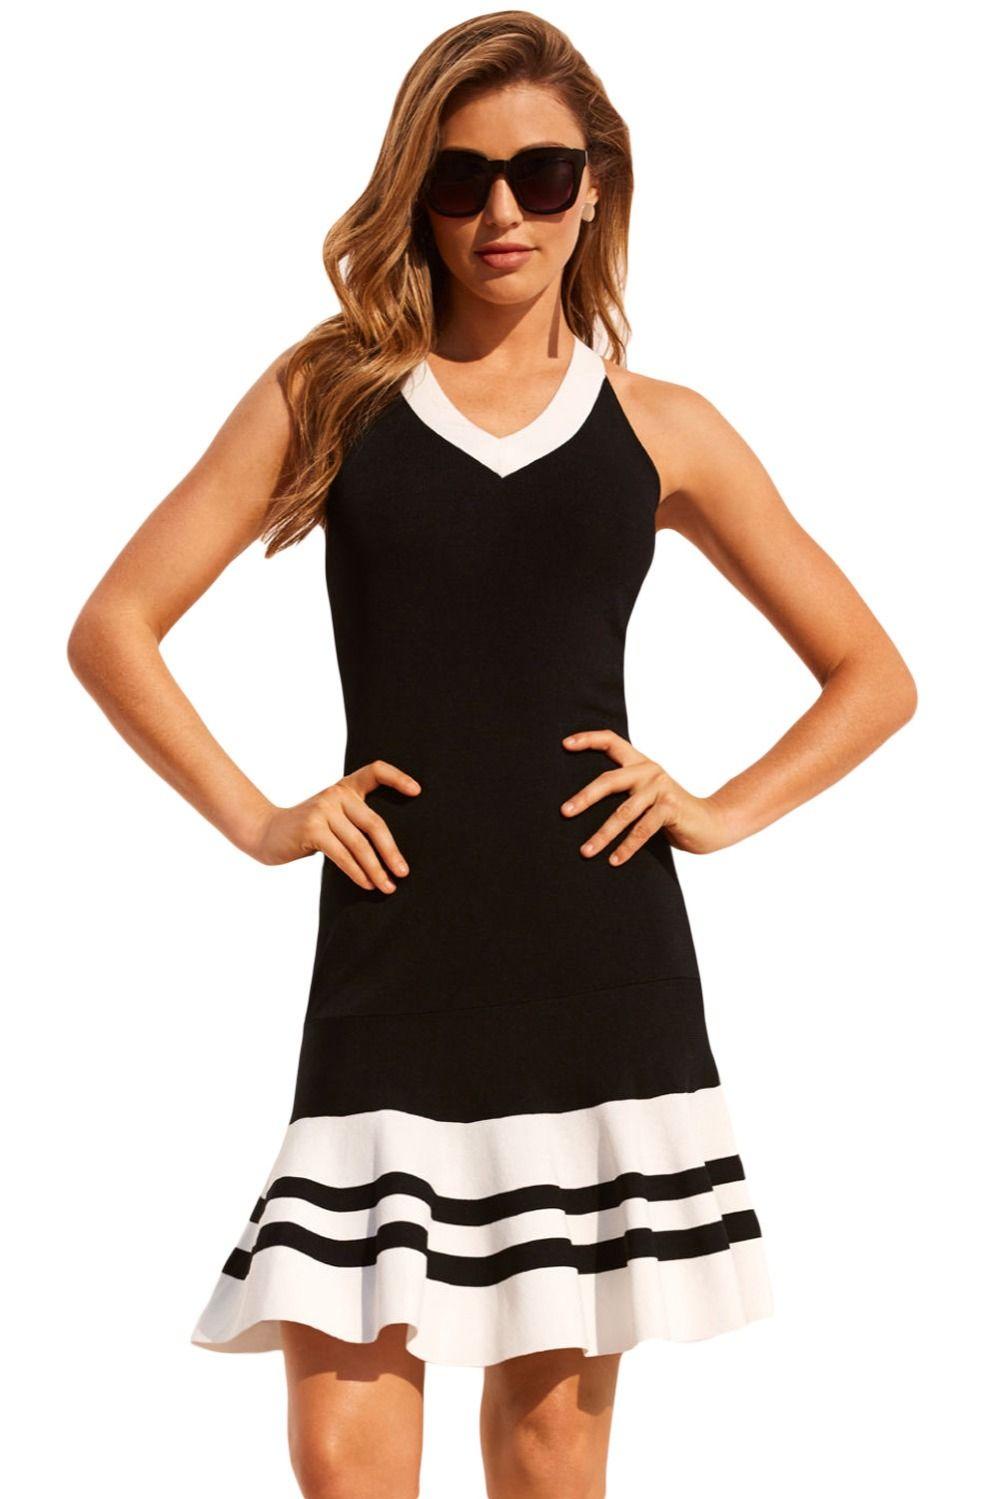 b63642244dad Dear Lover Women Party Dresses Summer Burgundy Black White Cute Sleeveless  Ruffle Hem Crisscross Back Strap Mini Active Dress LC220373 Party Dresses  Sleeves ...